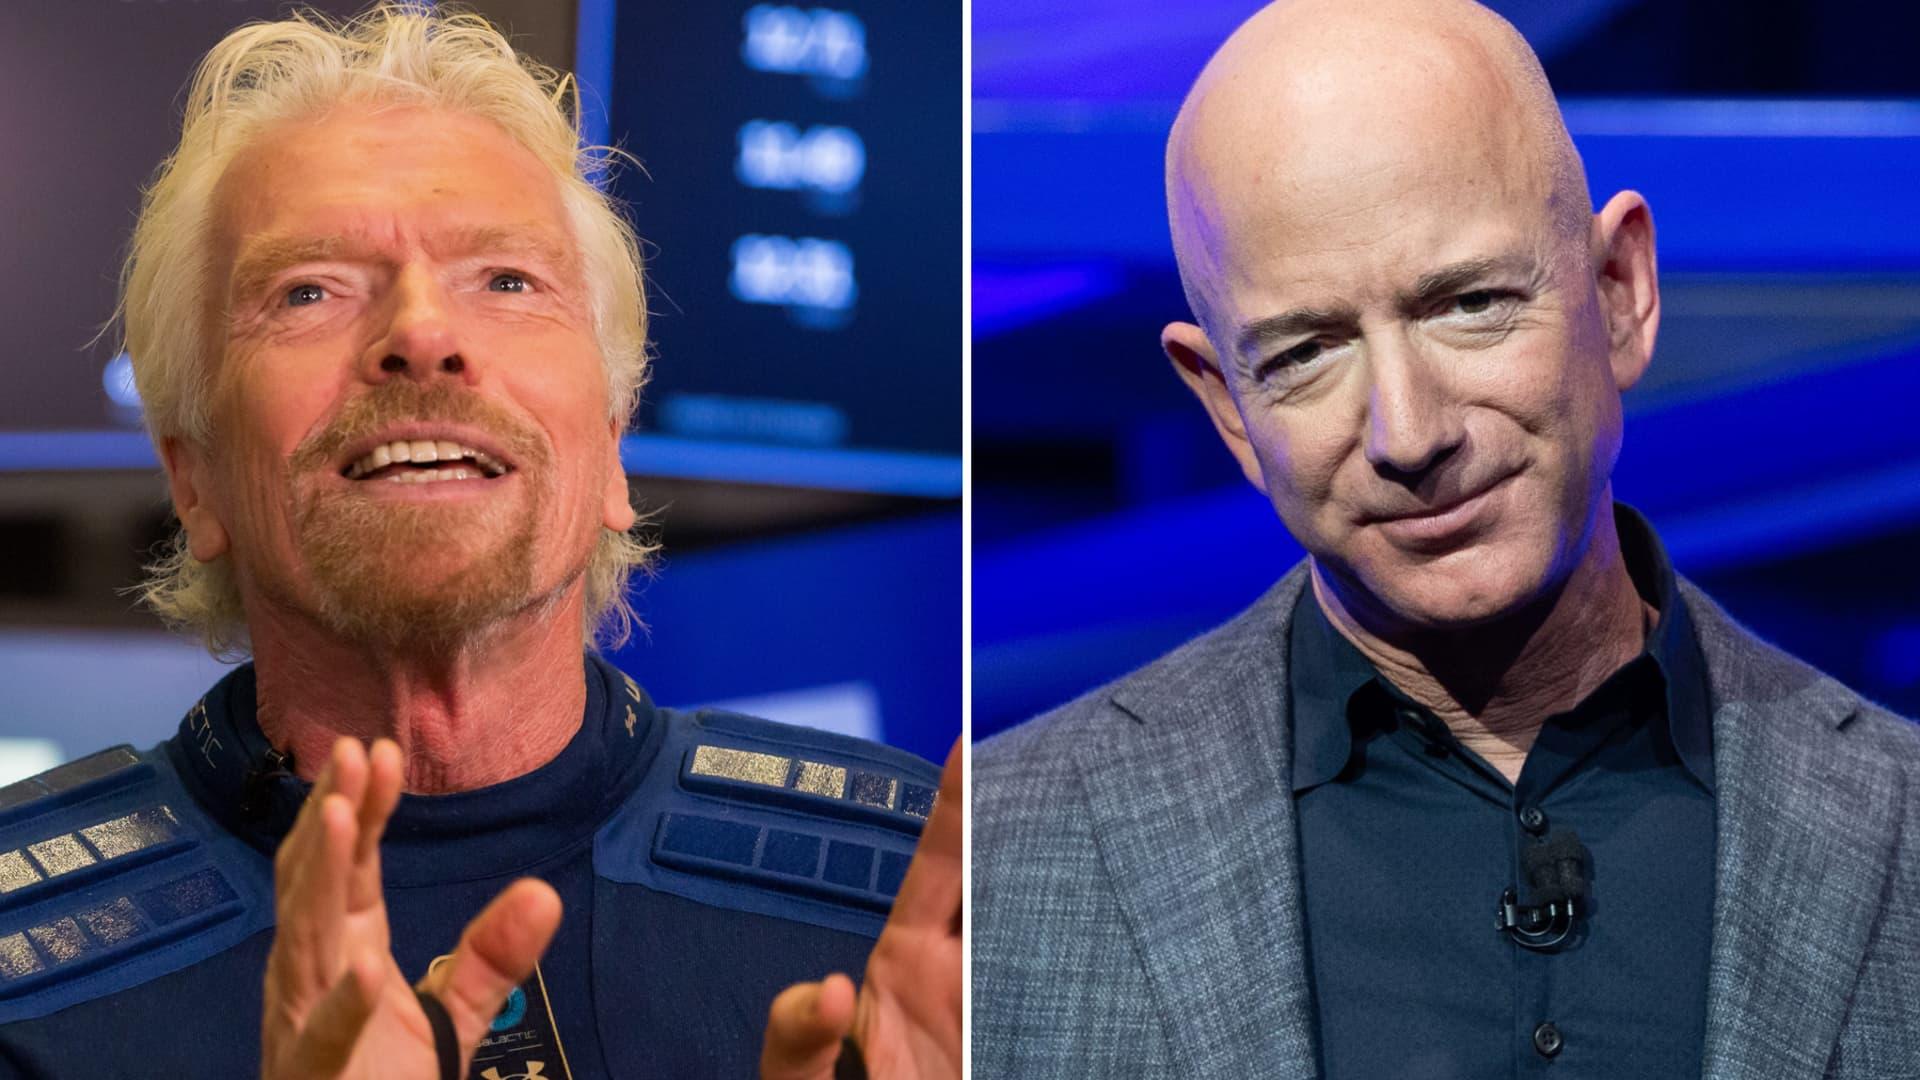 Virgin Galactic's Sir Richard Branson (L) and Blue Origin's founder Jeff Bezos.